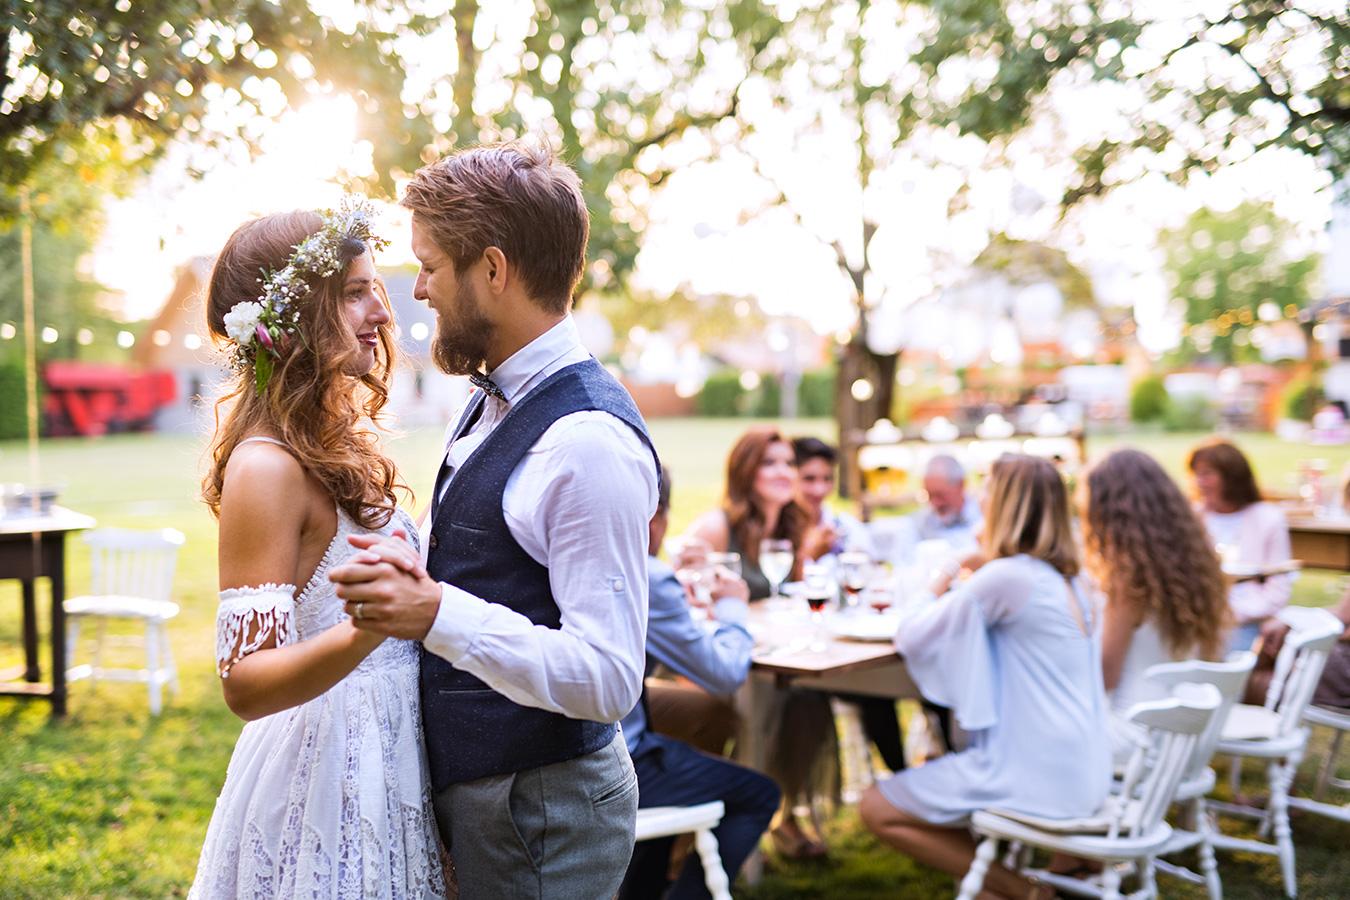 Things to Plan for When You're Having a Backyard Wedding ...